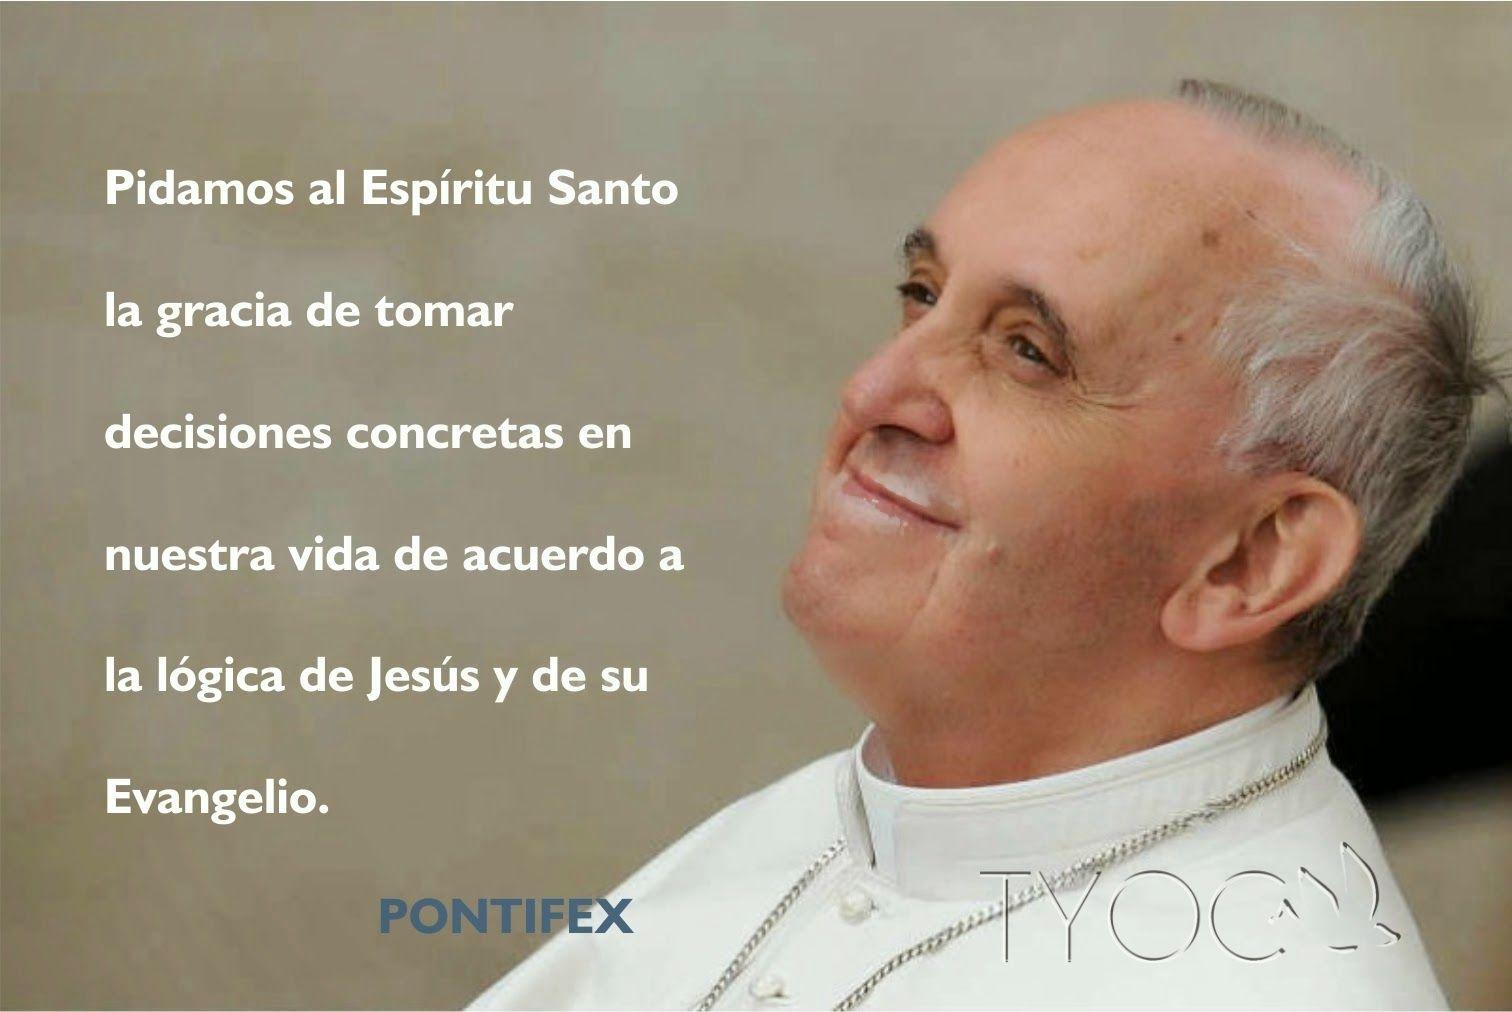 Blog Católico Gotitas Espirituales Besos En El Aire: BLOG CATÓLICO GOTITAS ESPIRITUALES: PENSAMIENTOS DEL PAPA